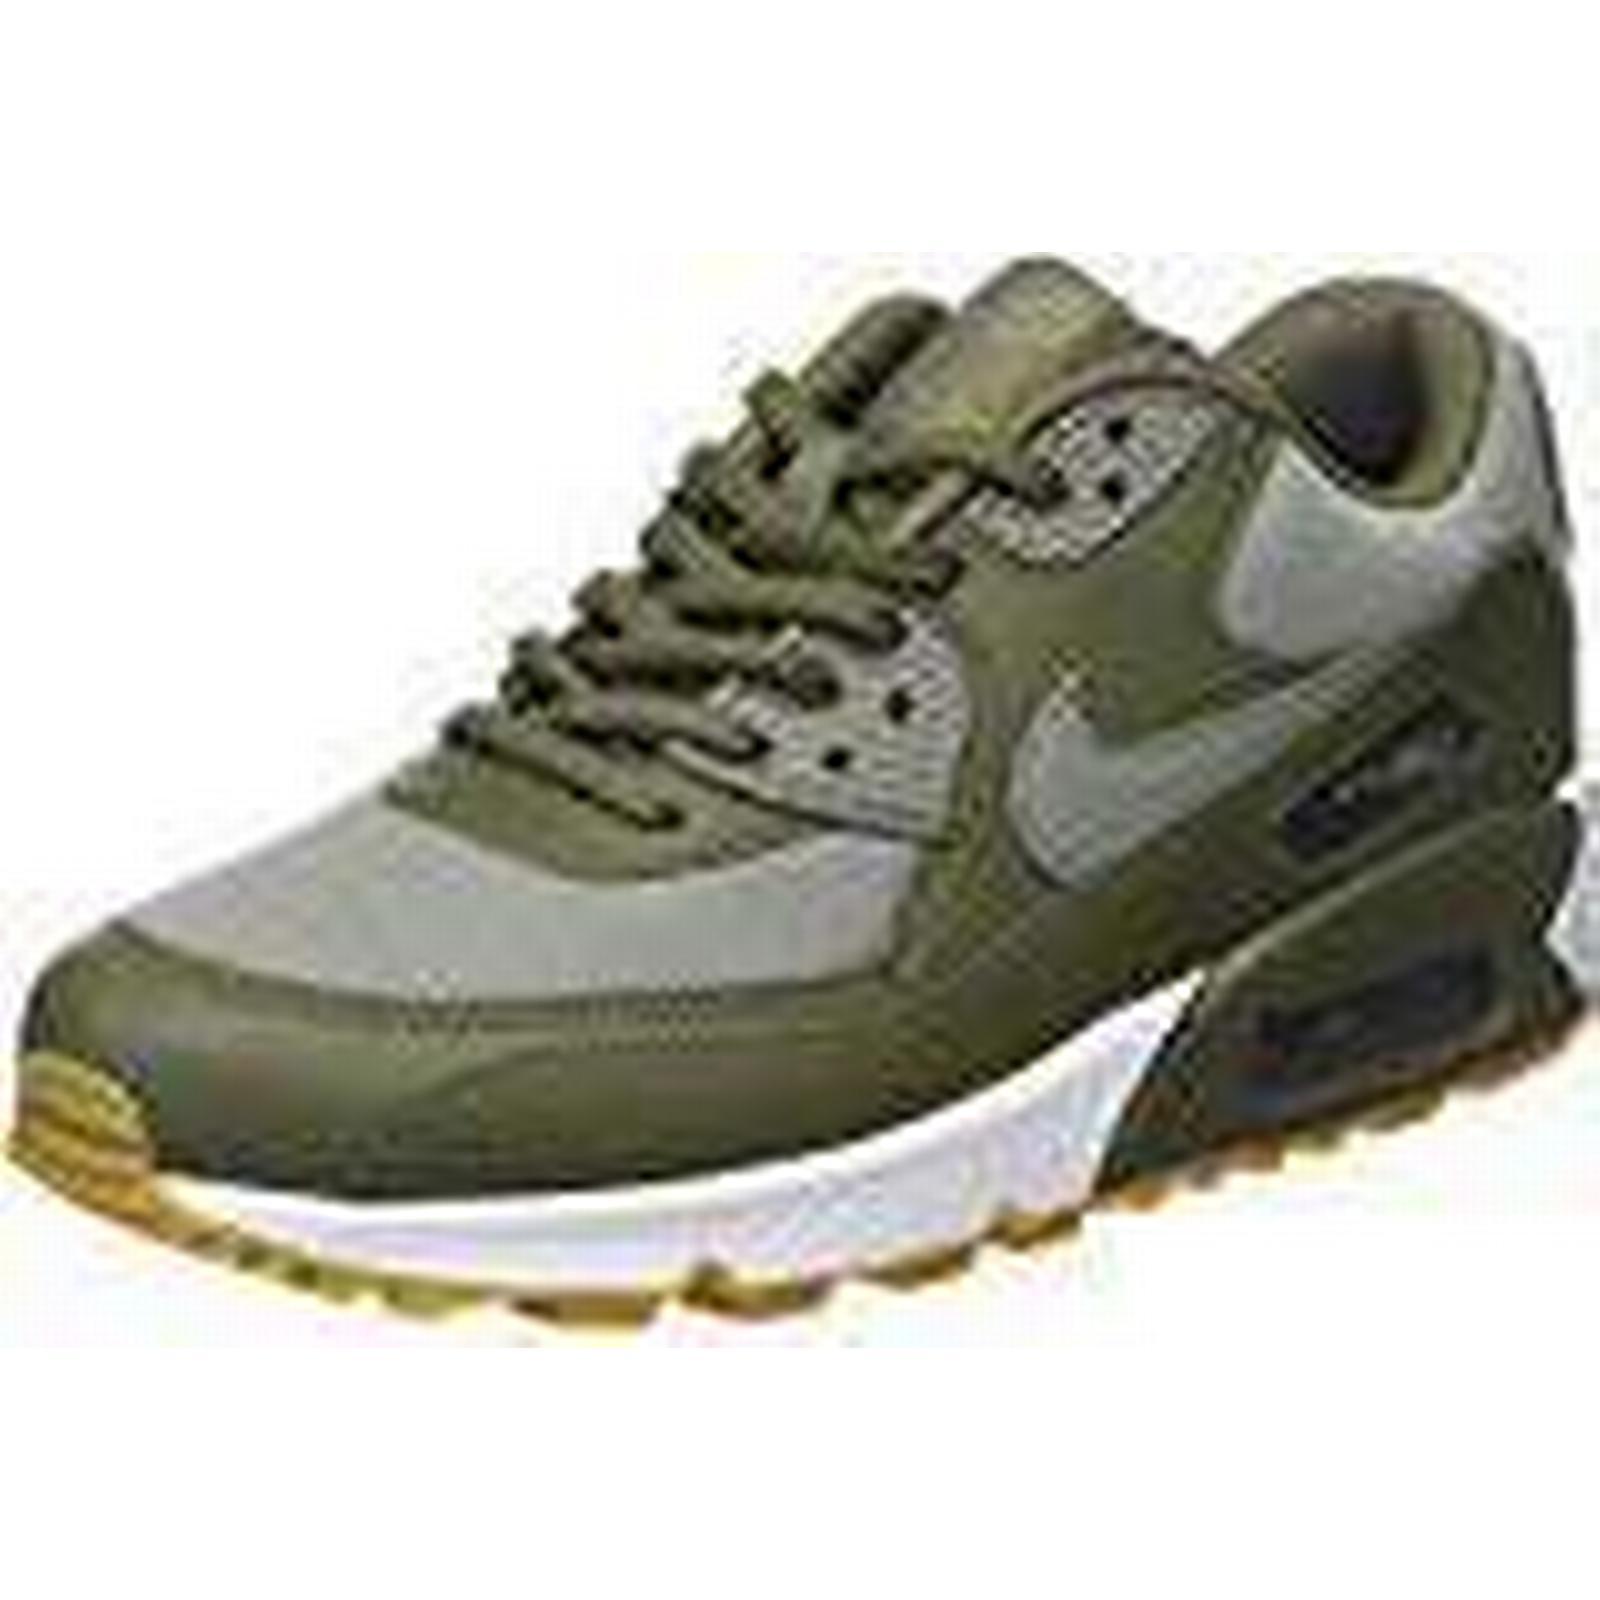 Nike Womens Air Max 90 Olive Dark Low Top Sneakers Green Med Stucco Sequoia Gum Light Brown 205 35 Uk 64f788